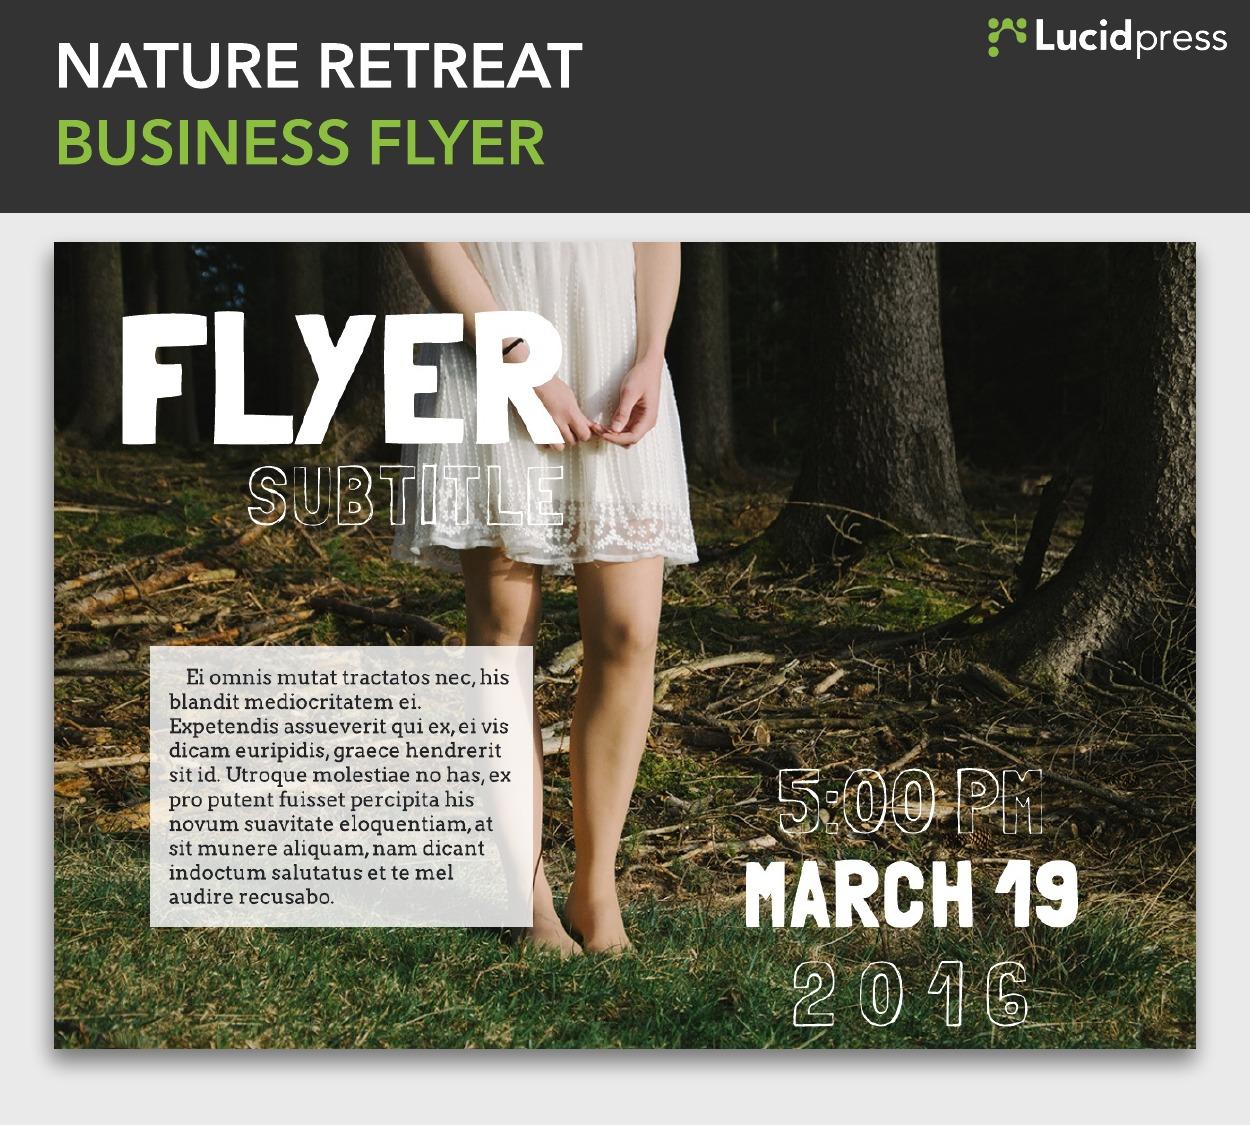 Nature Retreat Business Flyer